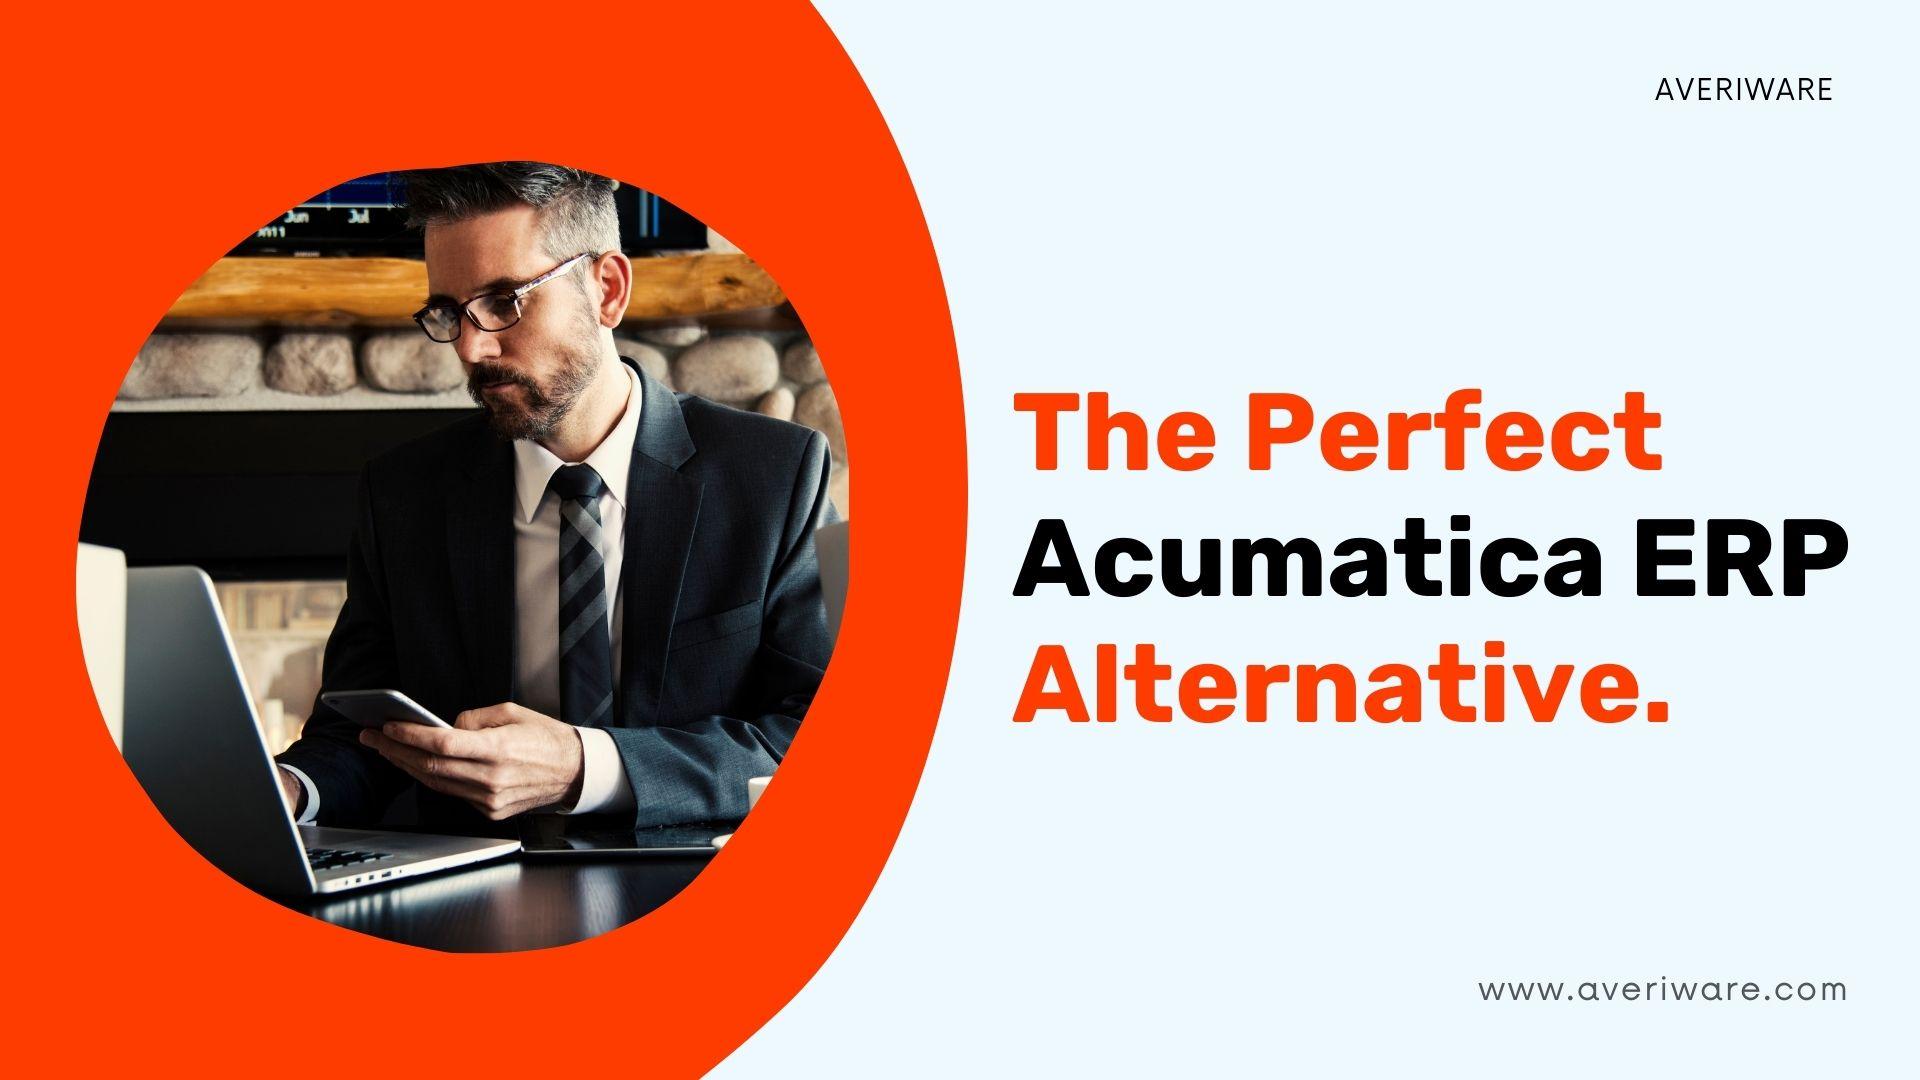 The Perfect Acumatica ERP Alternative